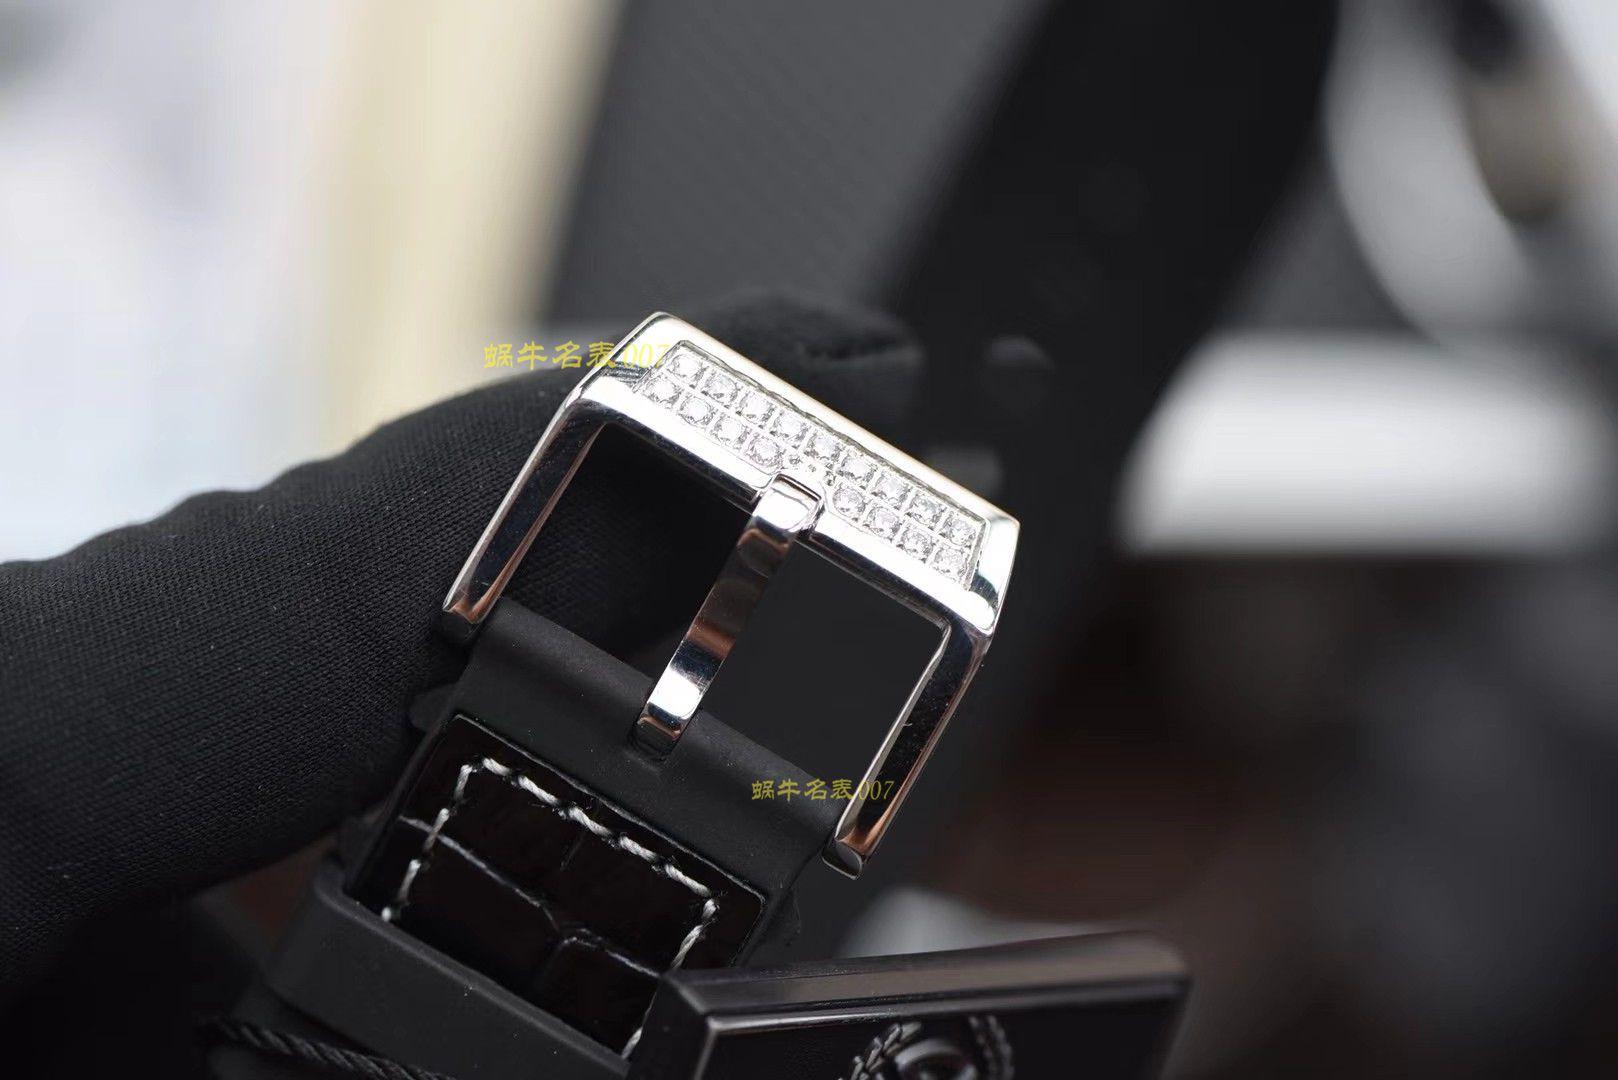 【ABS一比一超A高仿手表】法兰克穆勒MEN'S COLLECTION系列V 45 腕表 / FL036